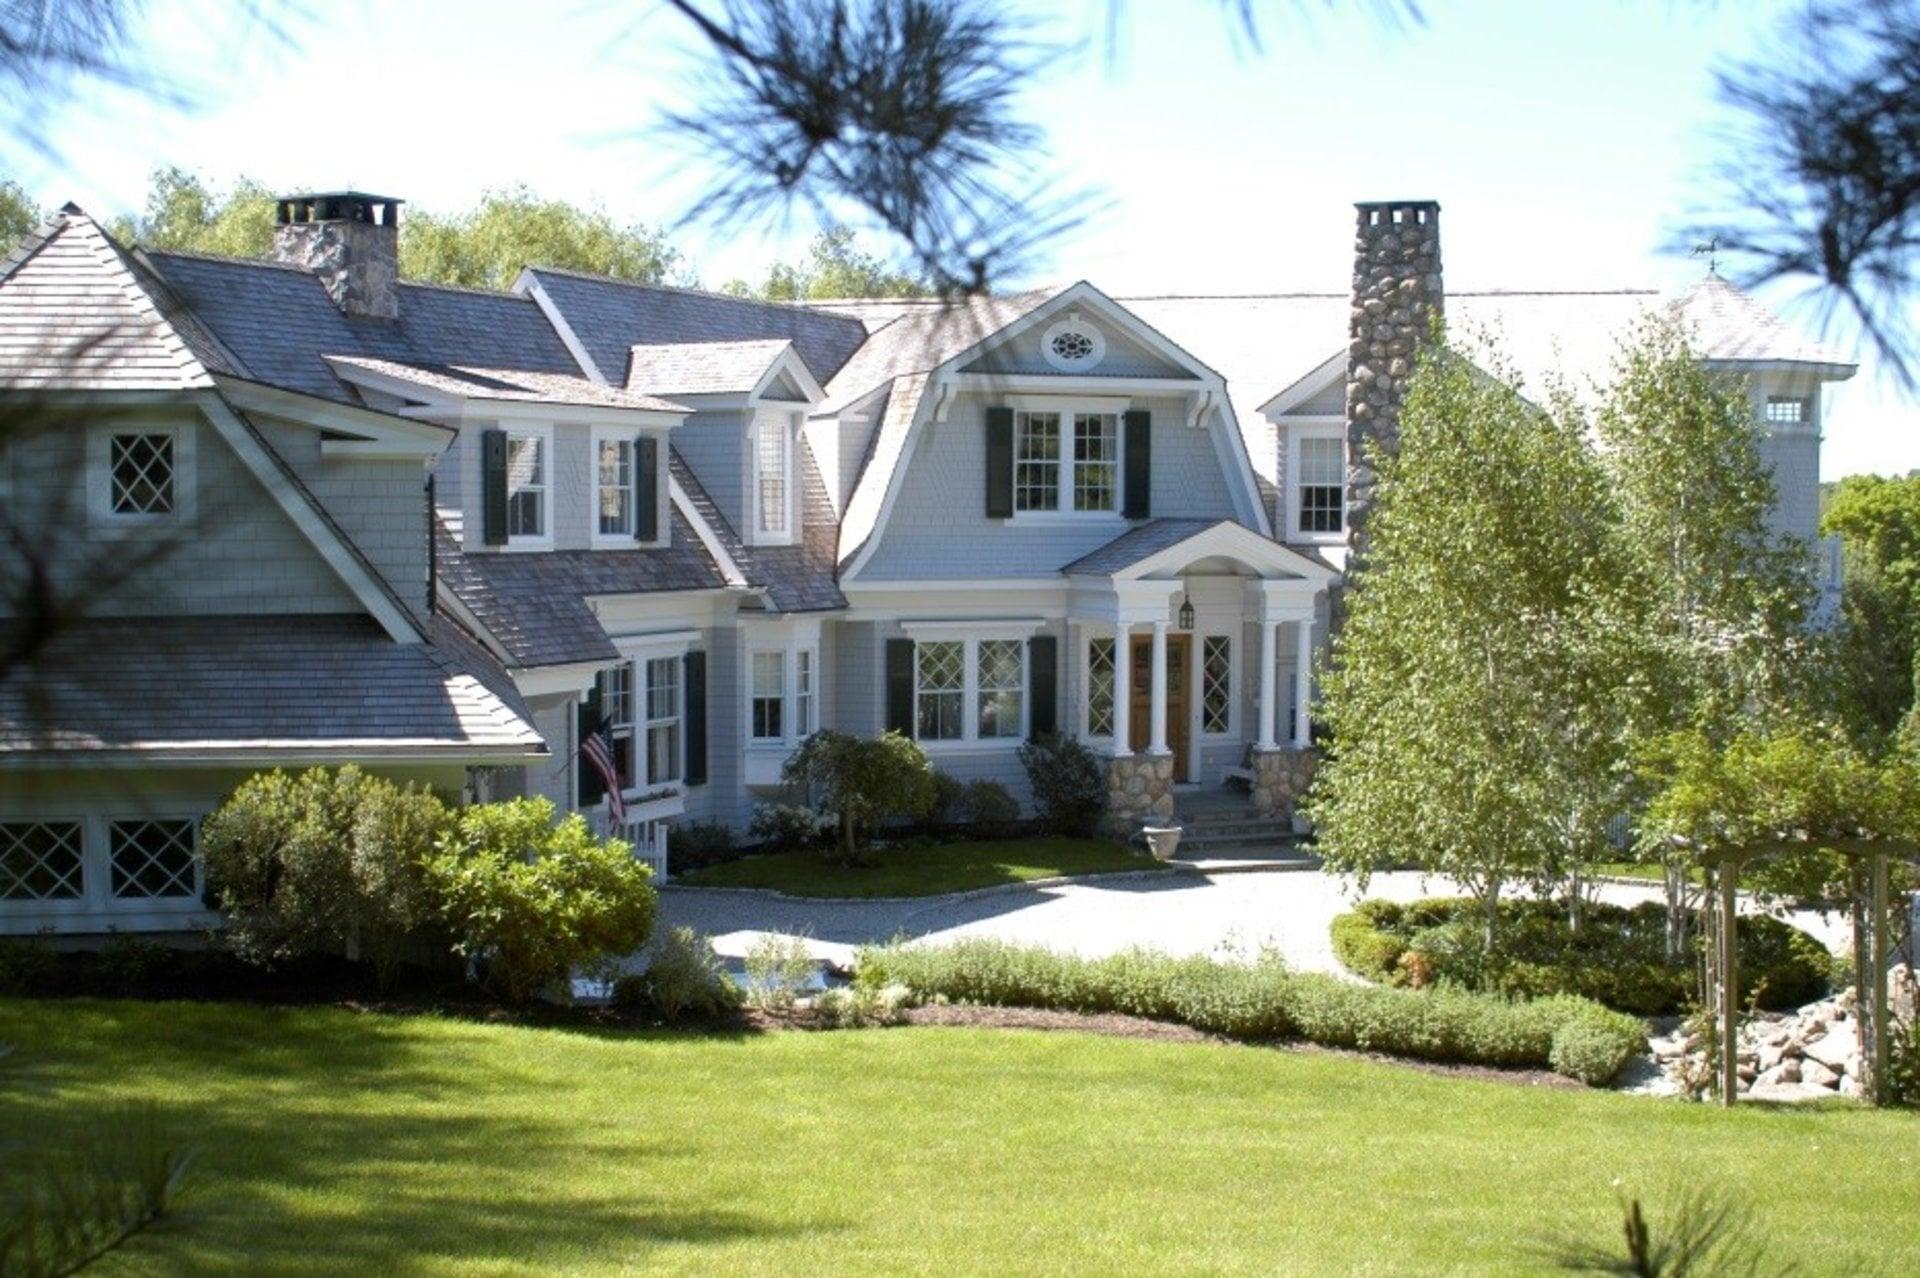 shingle style custom home wilton ct site visit - Home Design Site